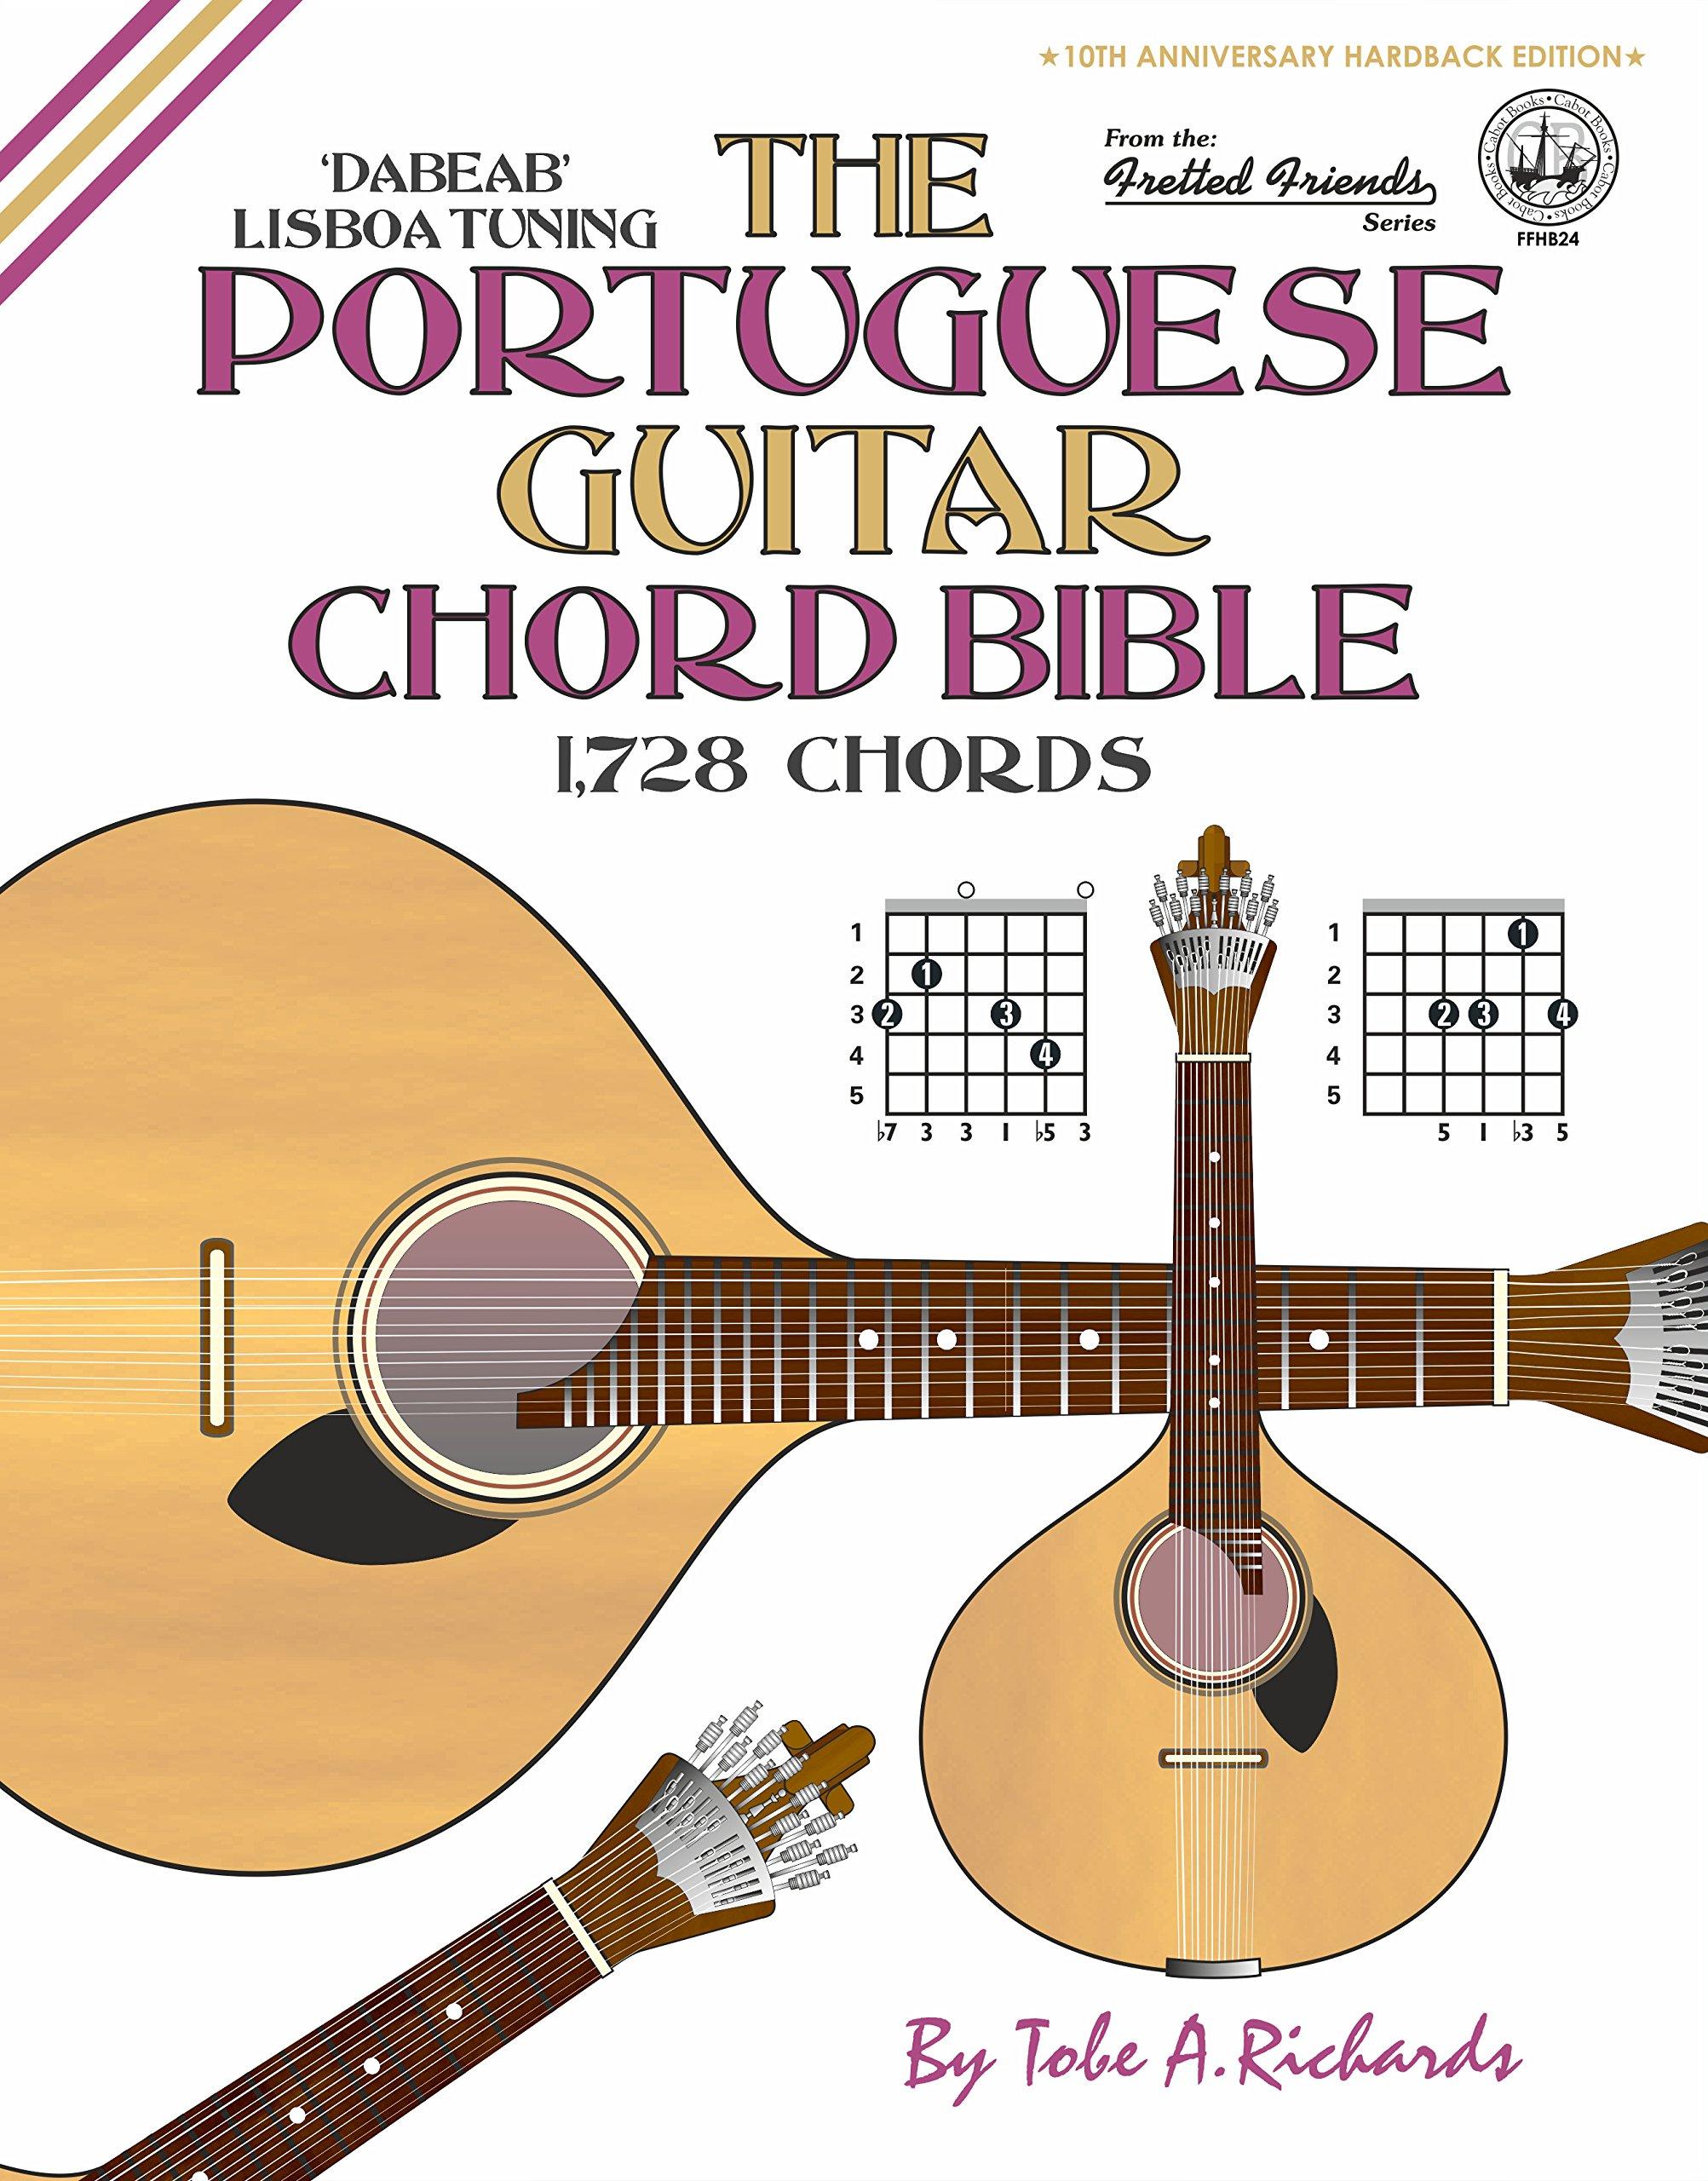 The Portuguese Guitar Chord Bible: Lisboa Tuning 1,728 Chords ...